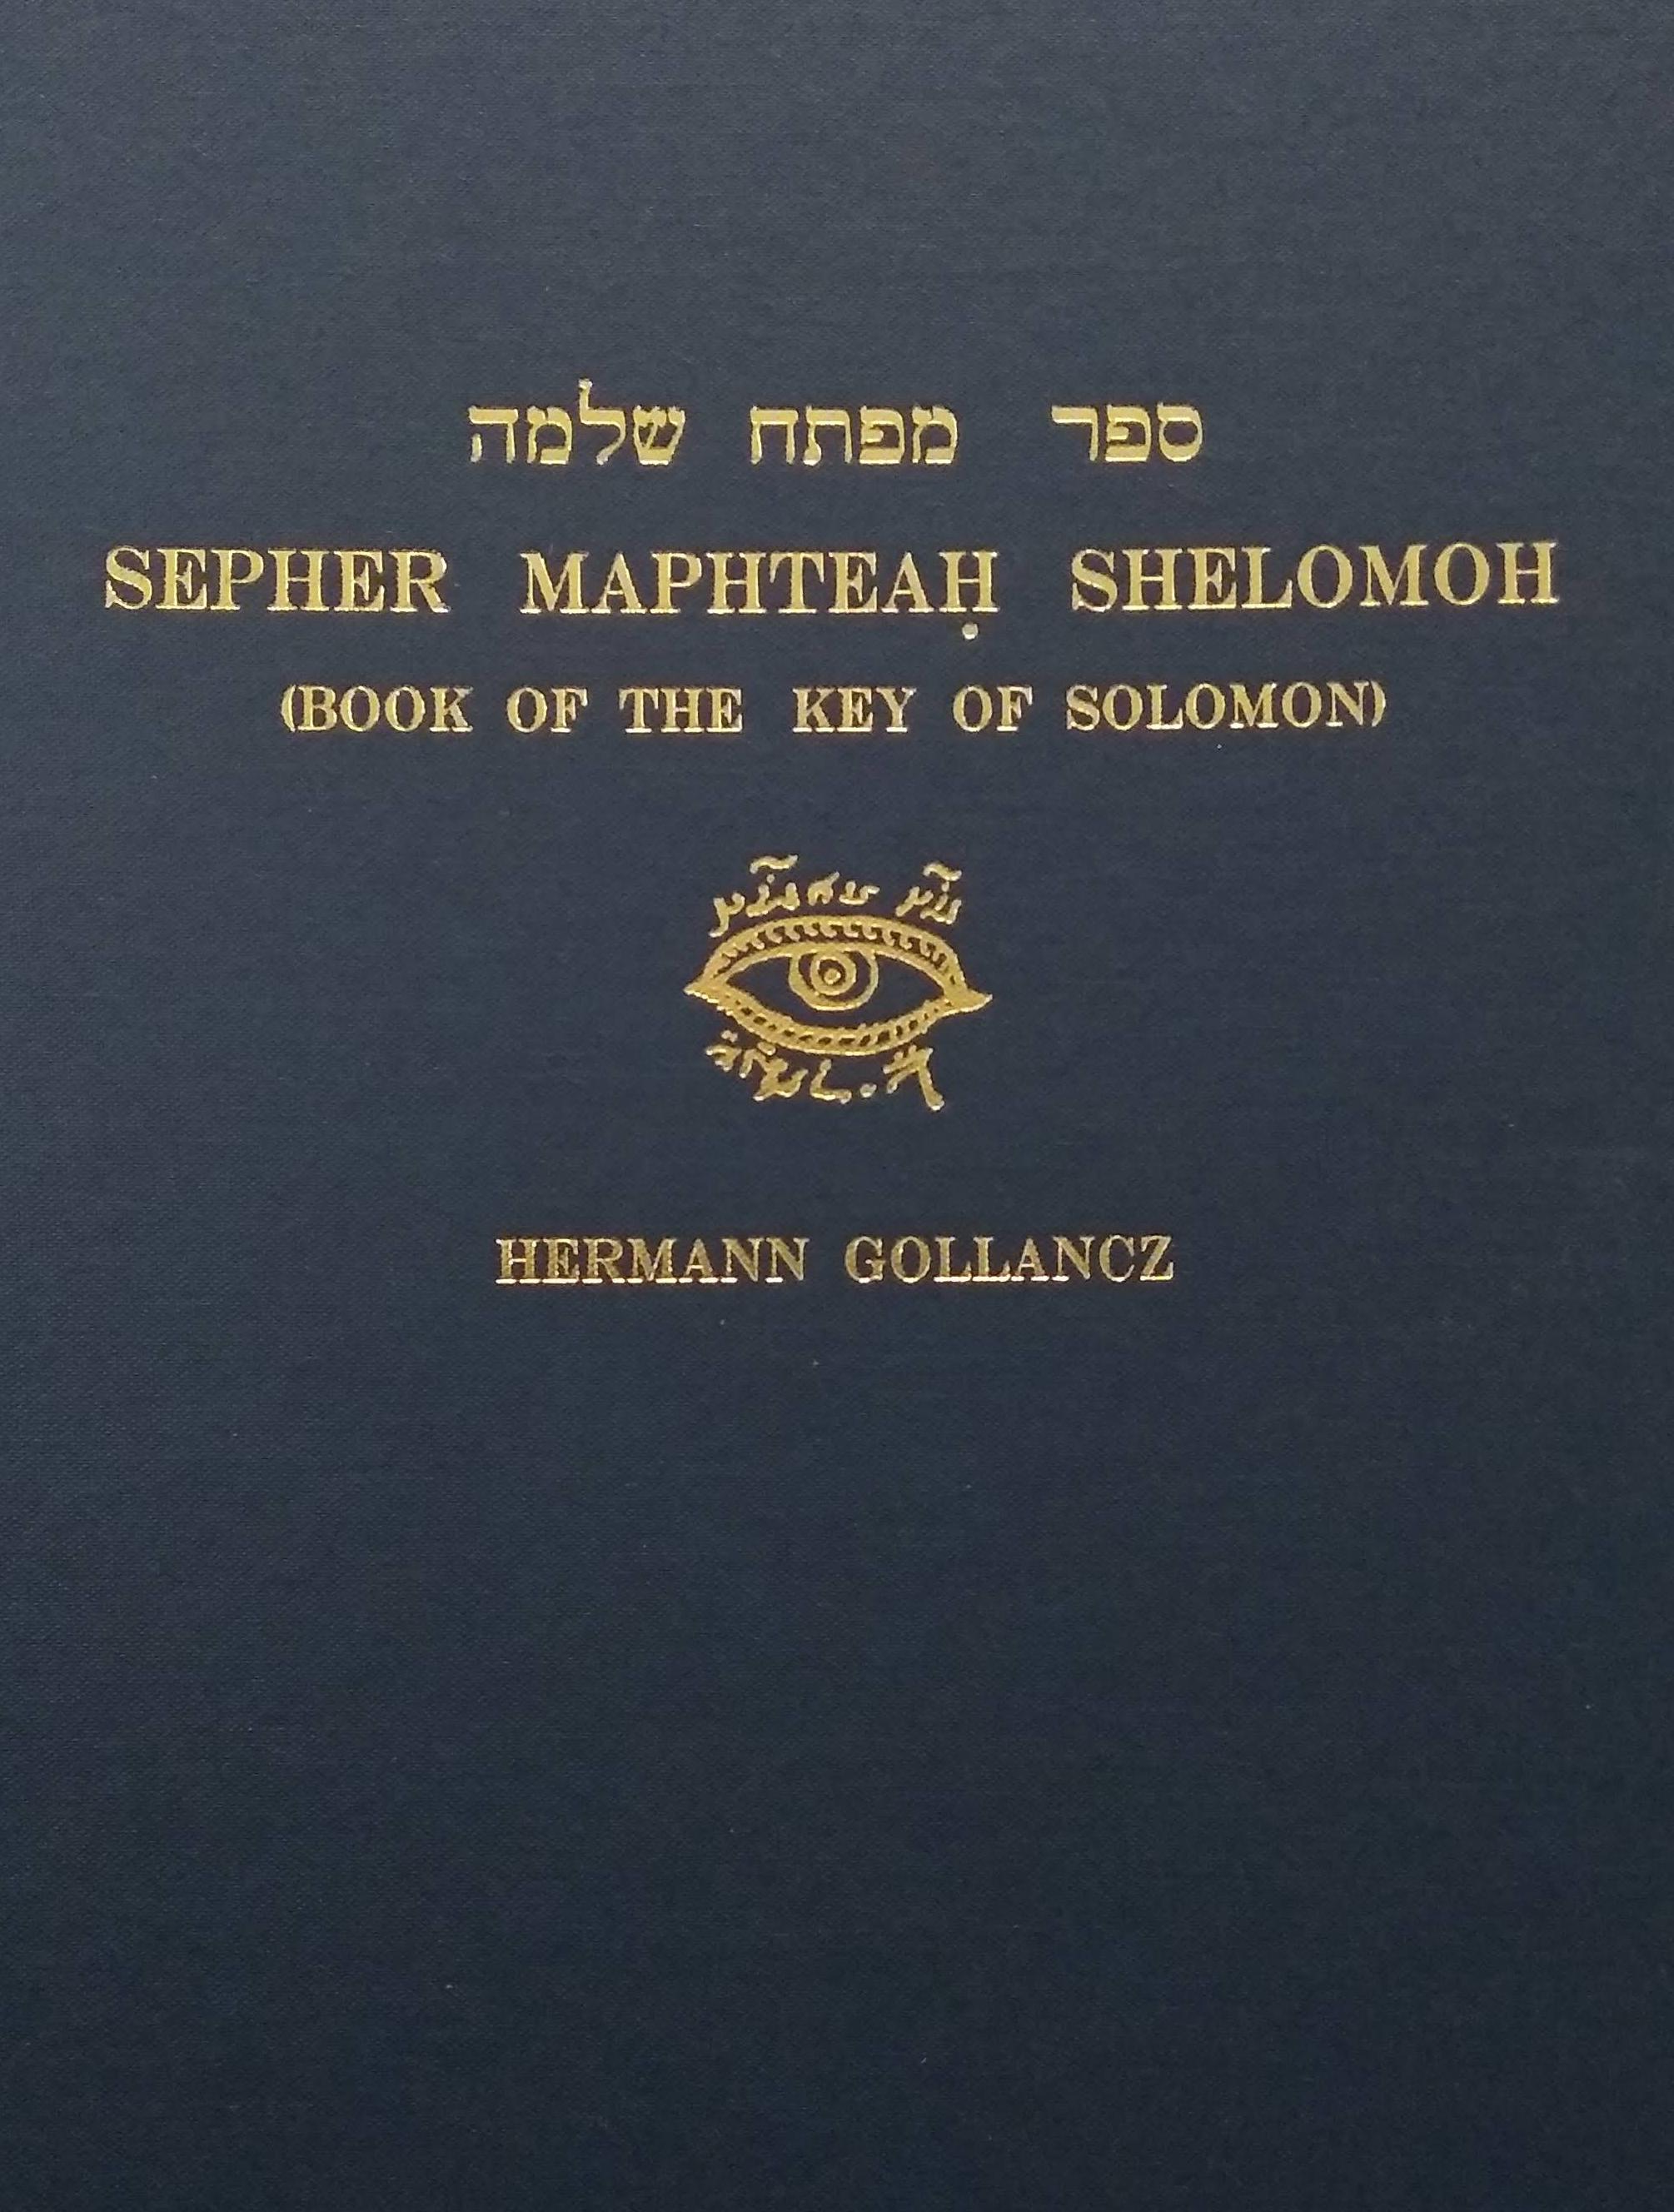 Sepher Maphteah Shelomoh